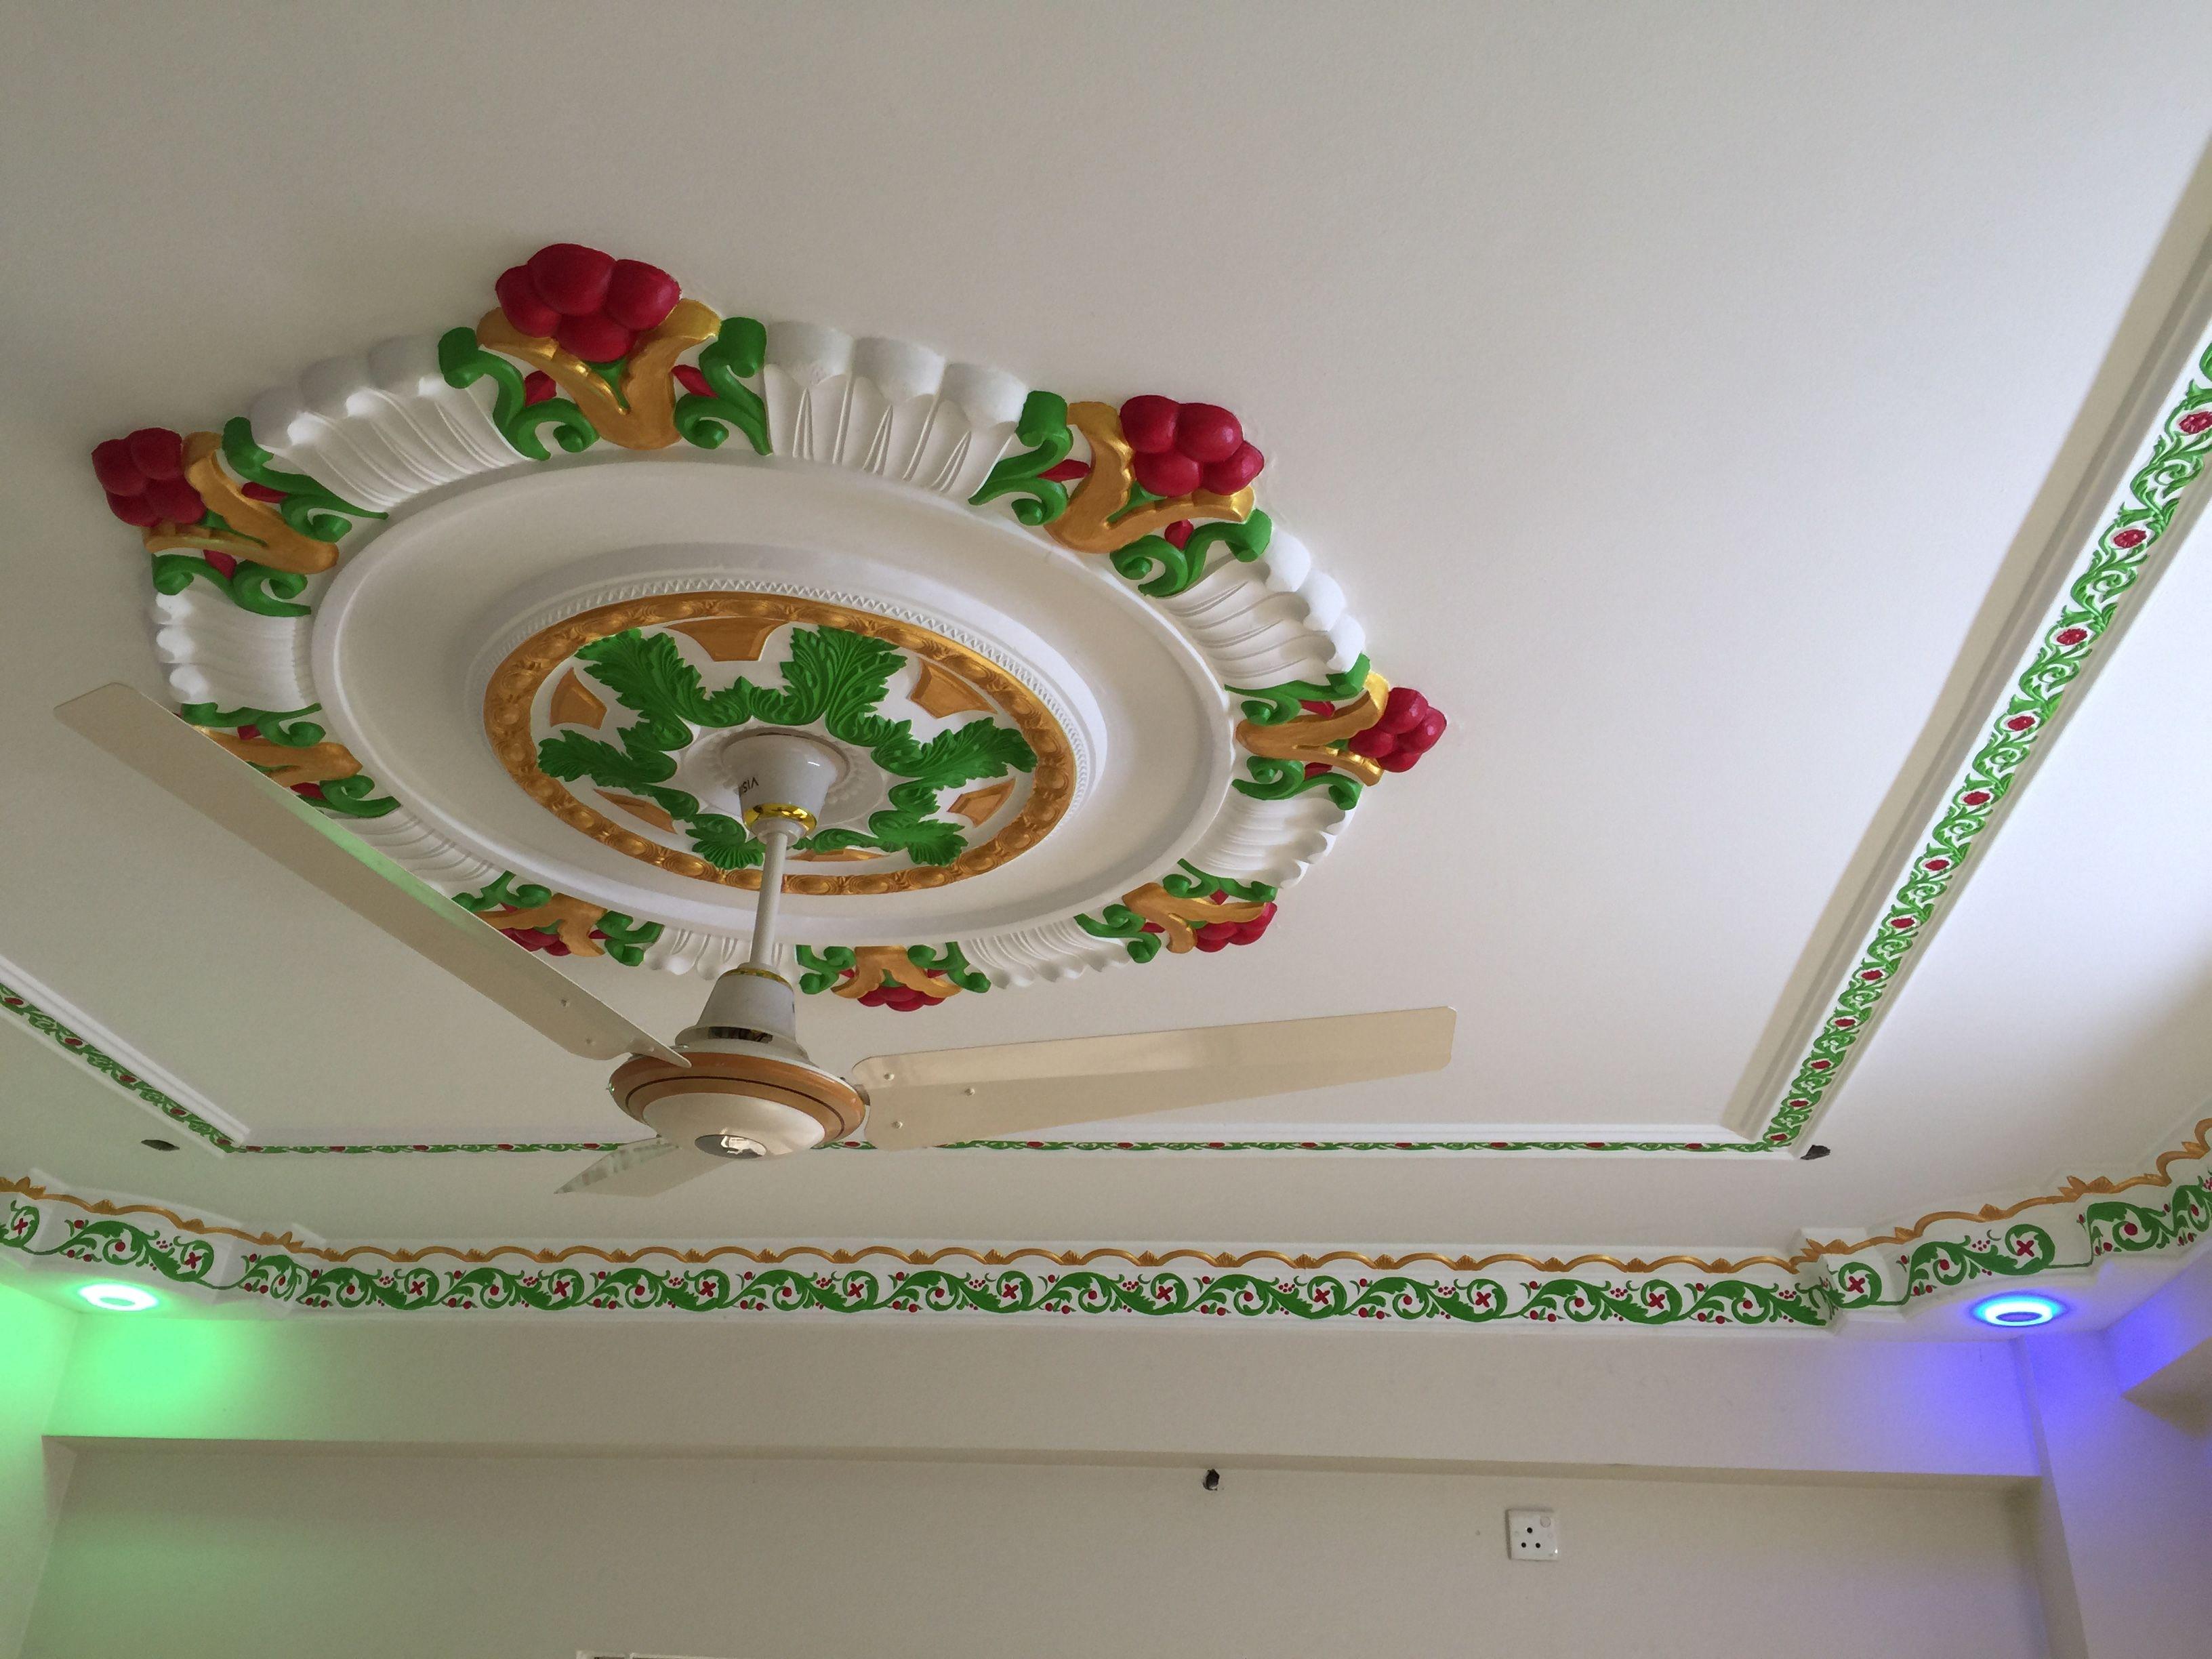 Nova Gypsum Decoration Is The Best Gypsum Decoration Interior Design Company In Dhaka Bangladesh G Gypsum Decoration Gypsum Design Interior Design Companies